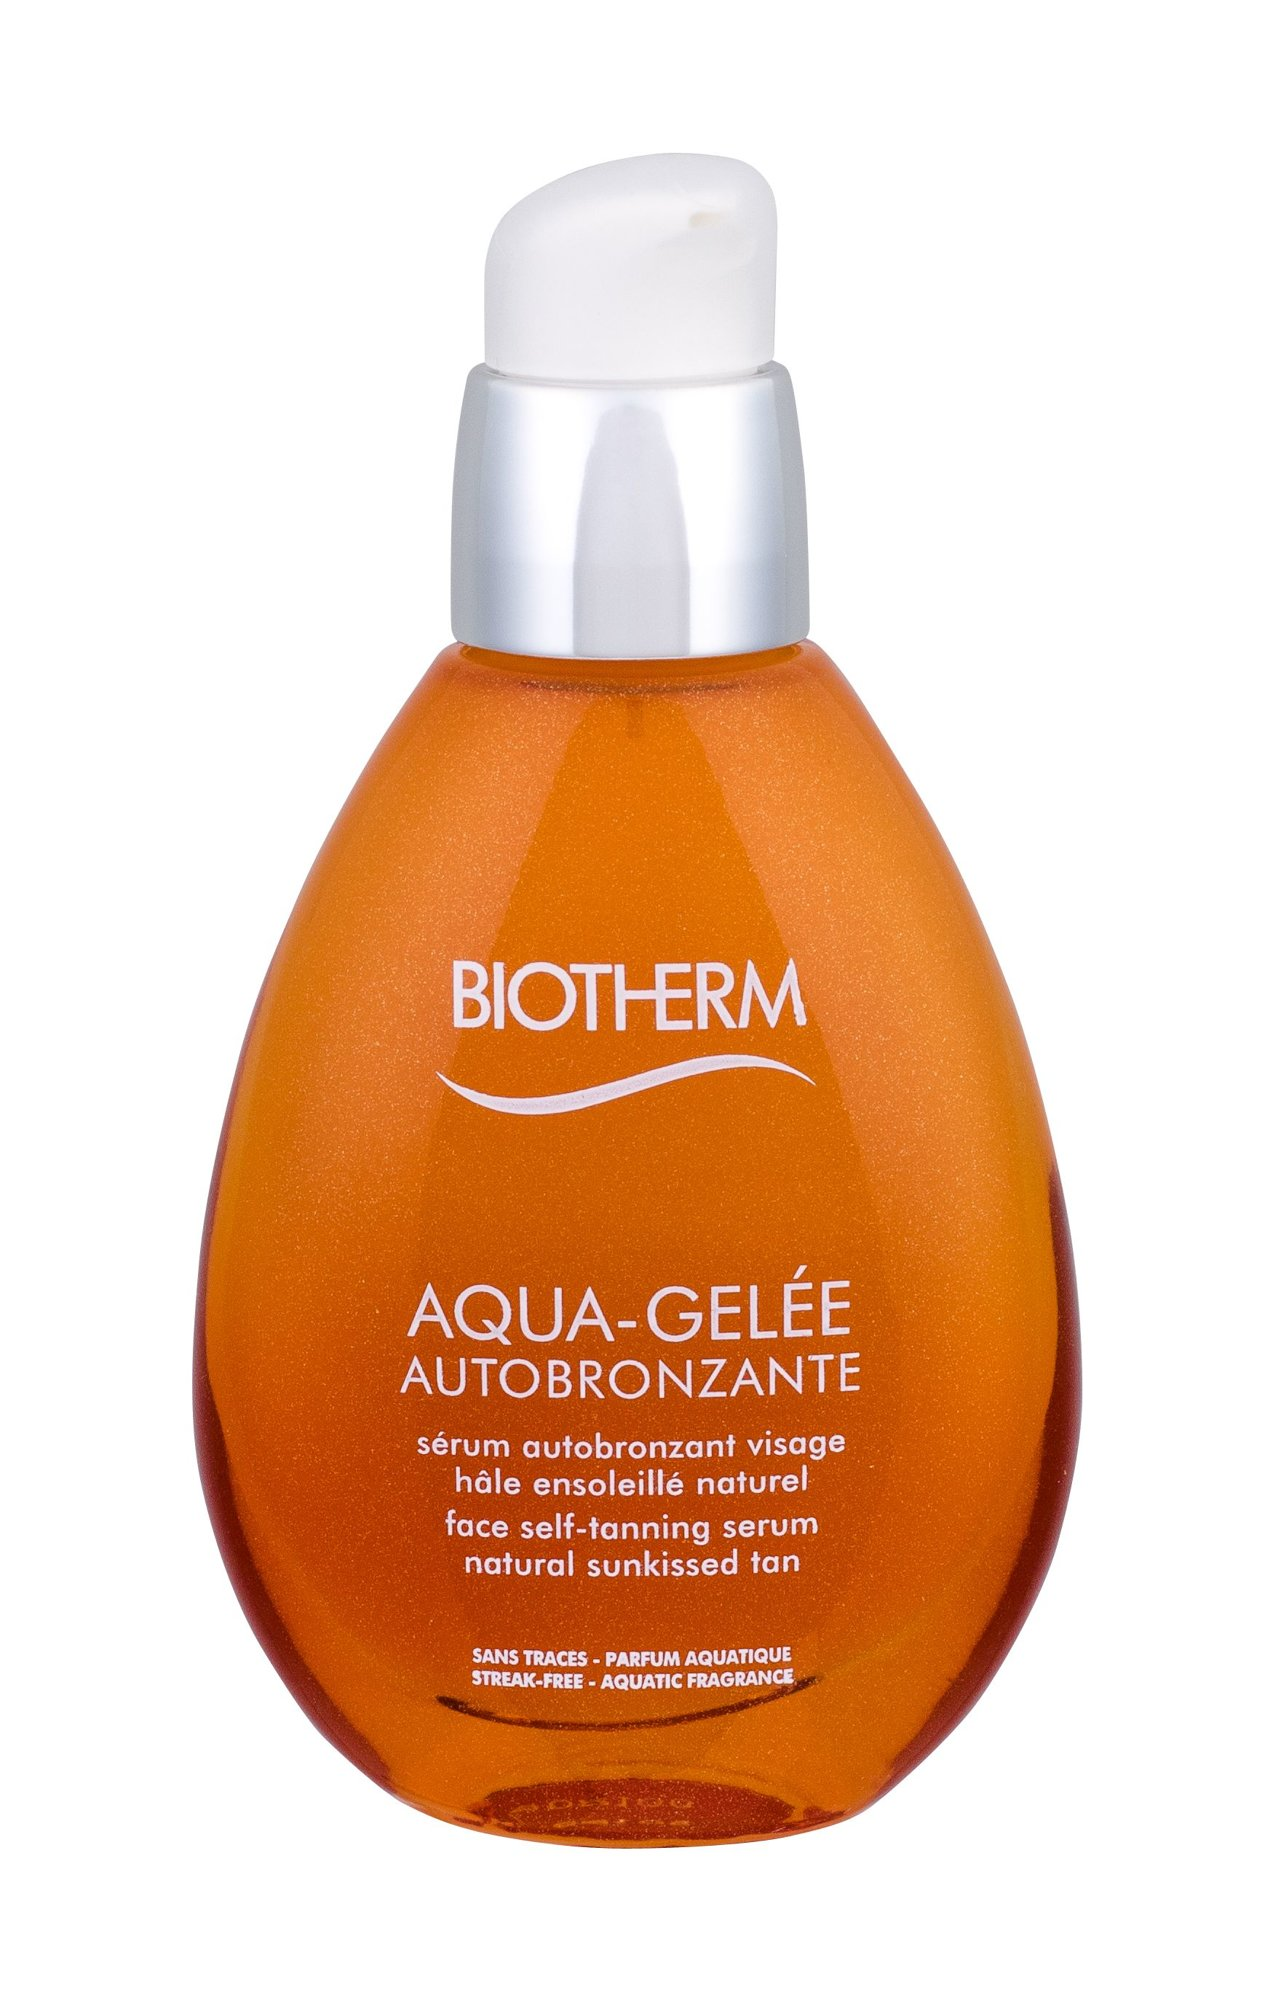 Biotherm Autobronzant Self Tanning Product 50ml  Aqua-Gelée